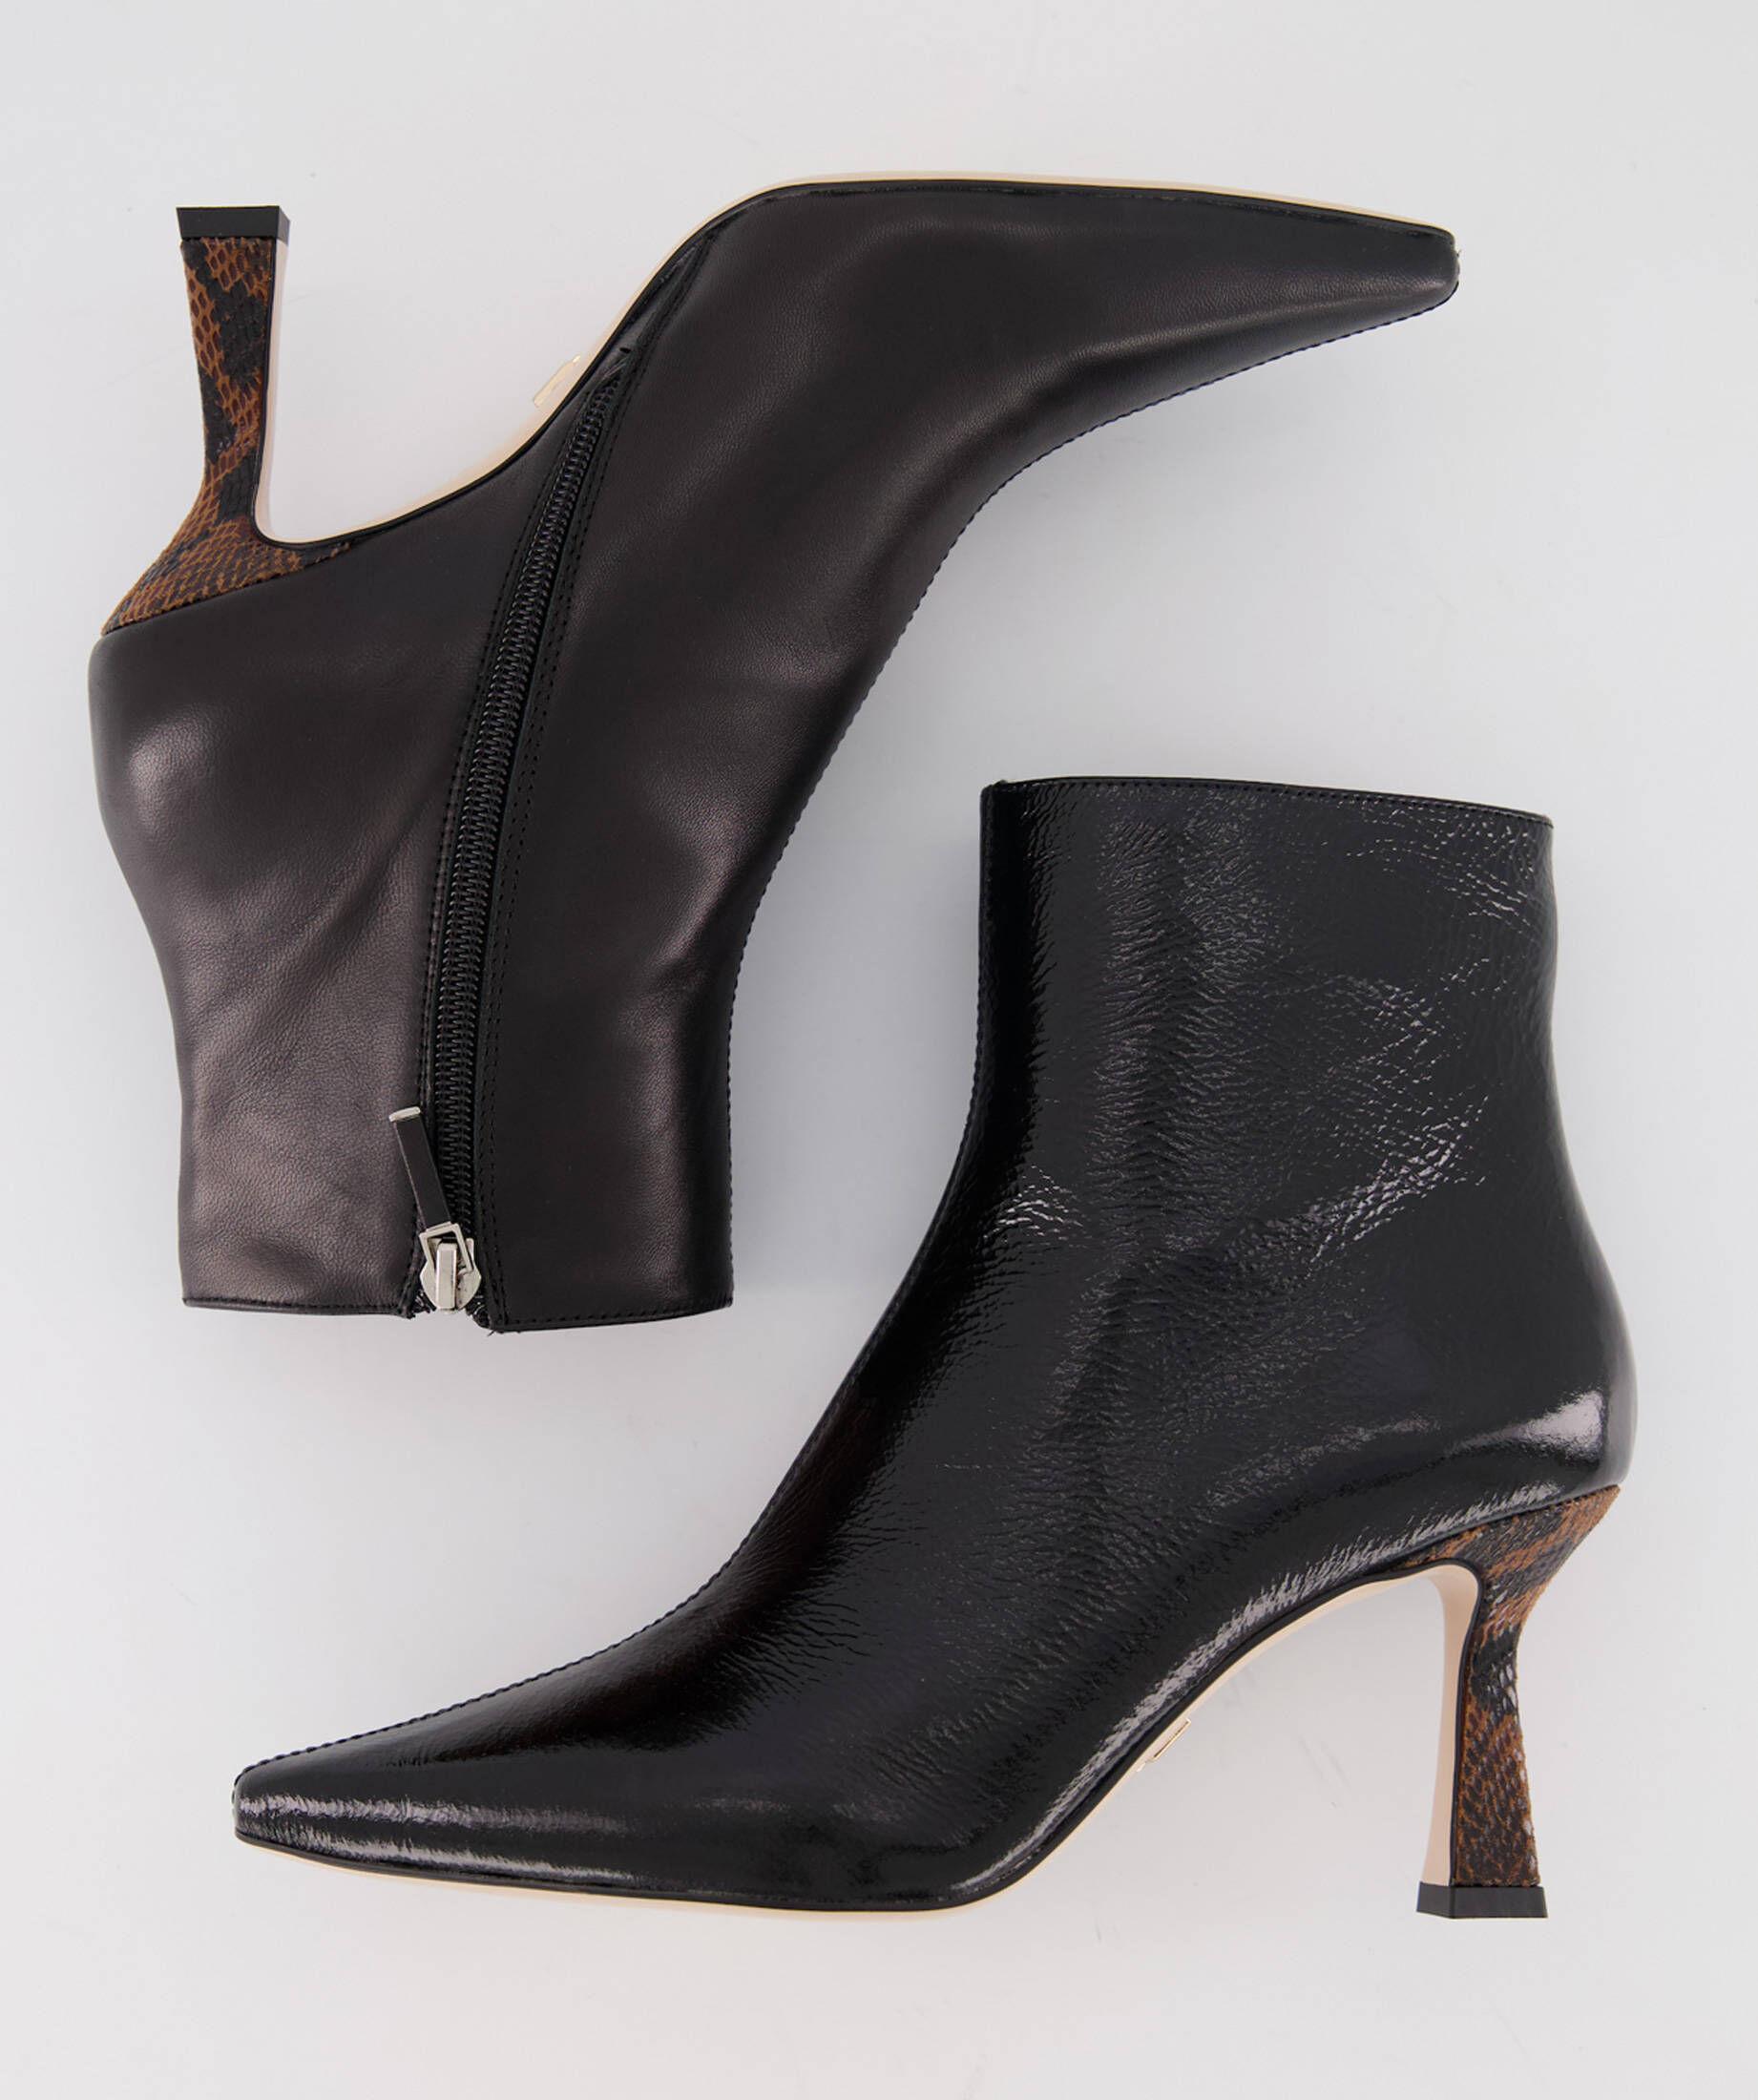 Sandalette Leder Lola Cruz Beige Absatzhöhe ca. 6 cm